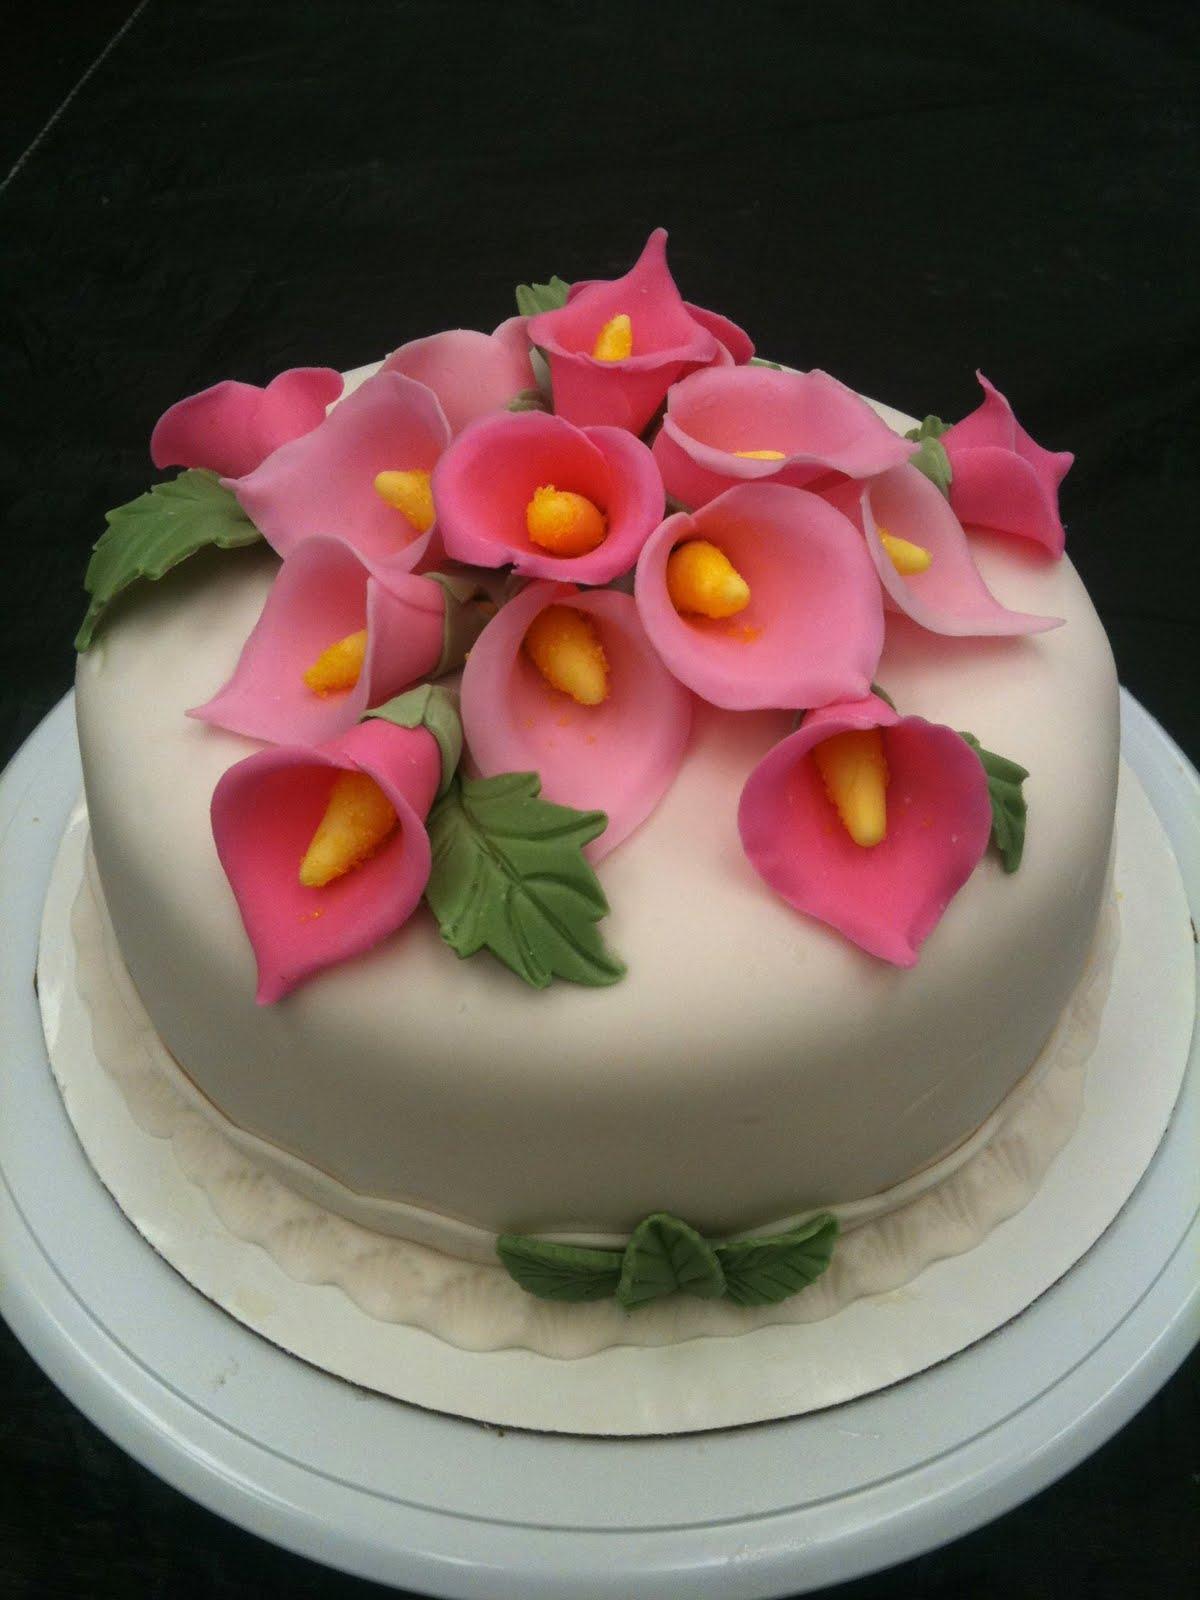 Cake Decorating By Sonia January 2011 Gum Paste Fondant